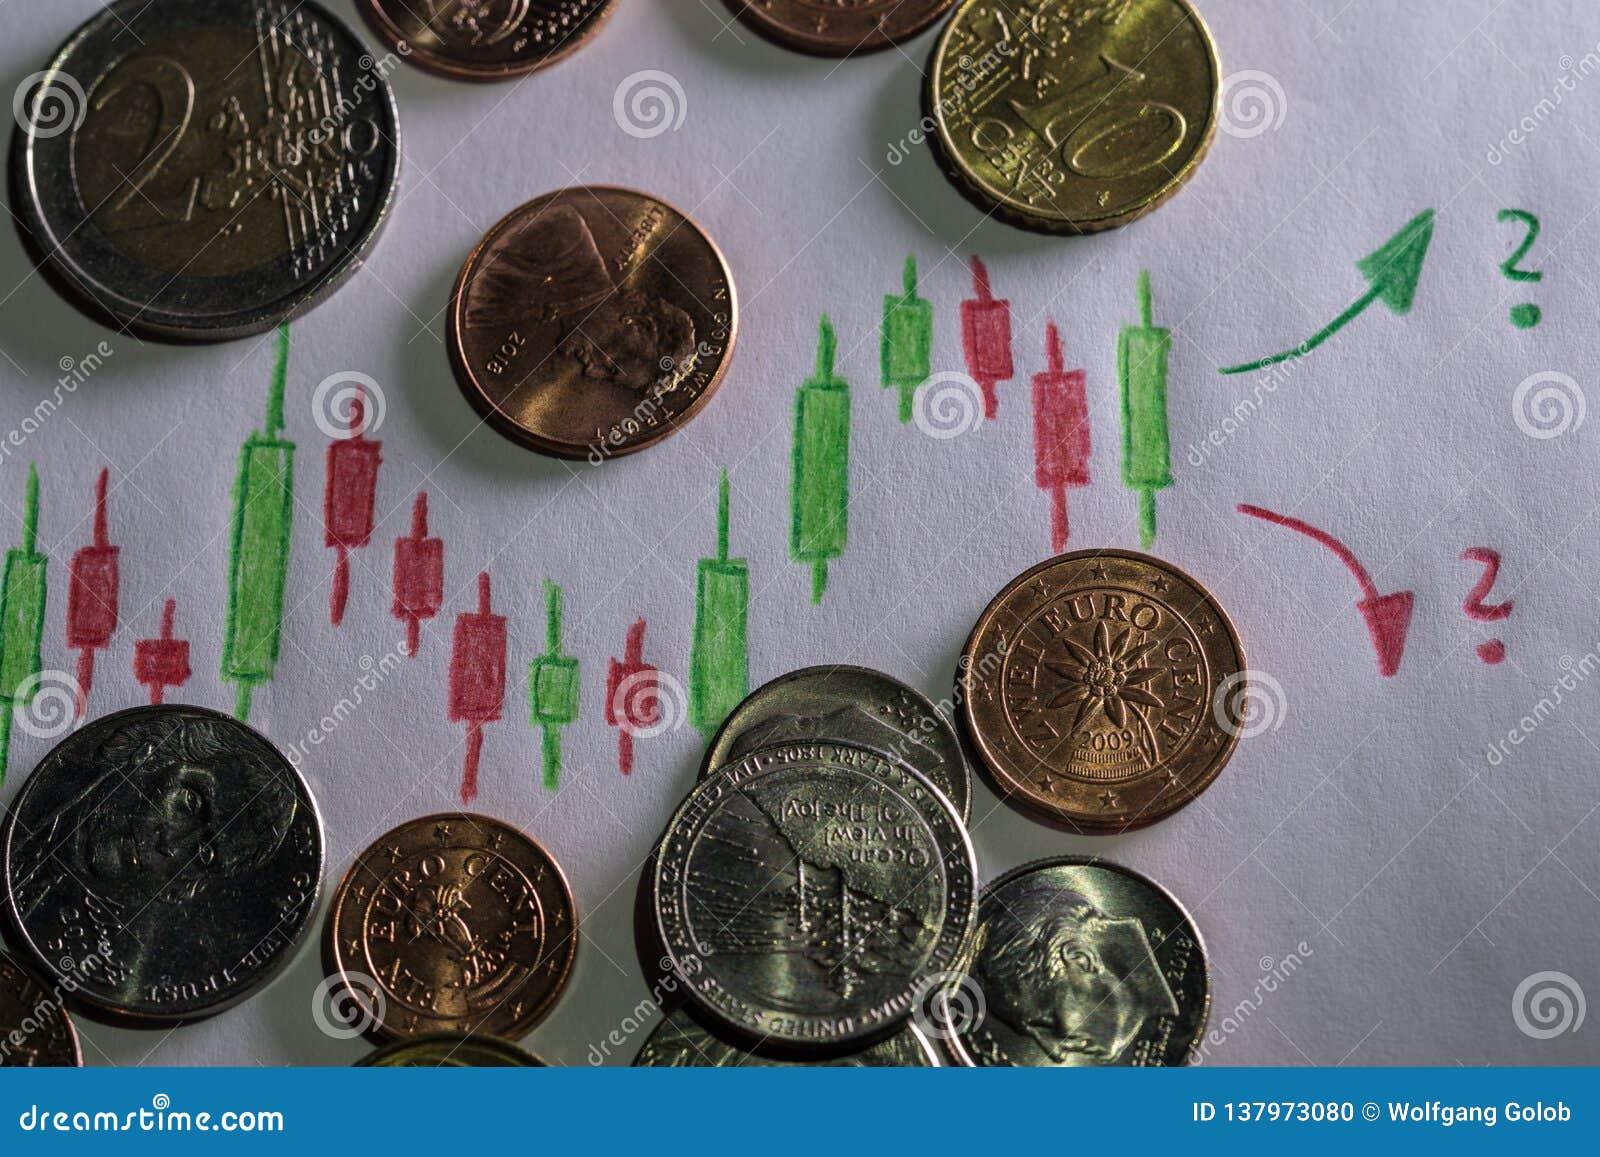 Stock analysis candlestick stock photo  Image of capital